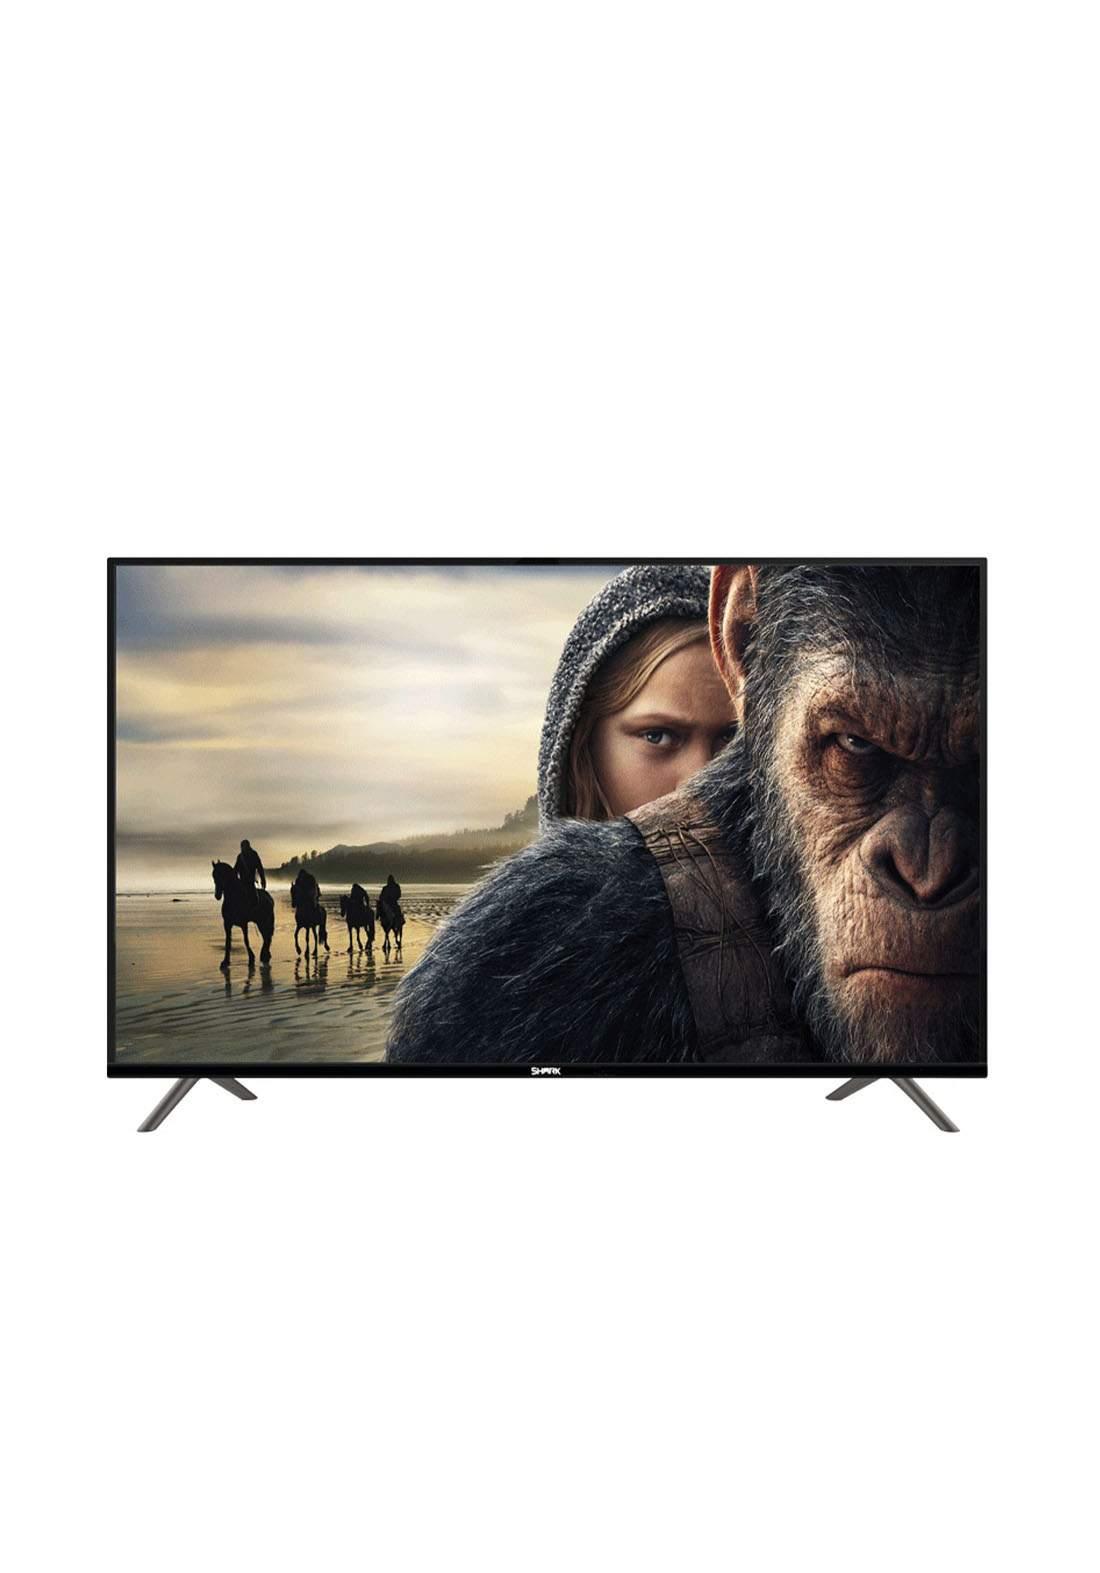 Shark Smart Led Tv - 60inch 4K شاشة ذكية